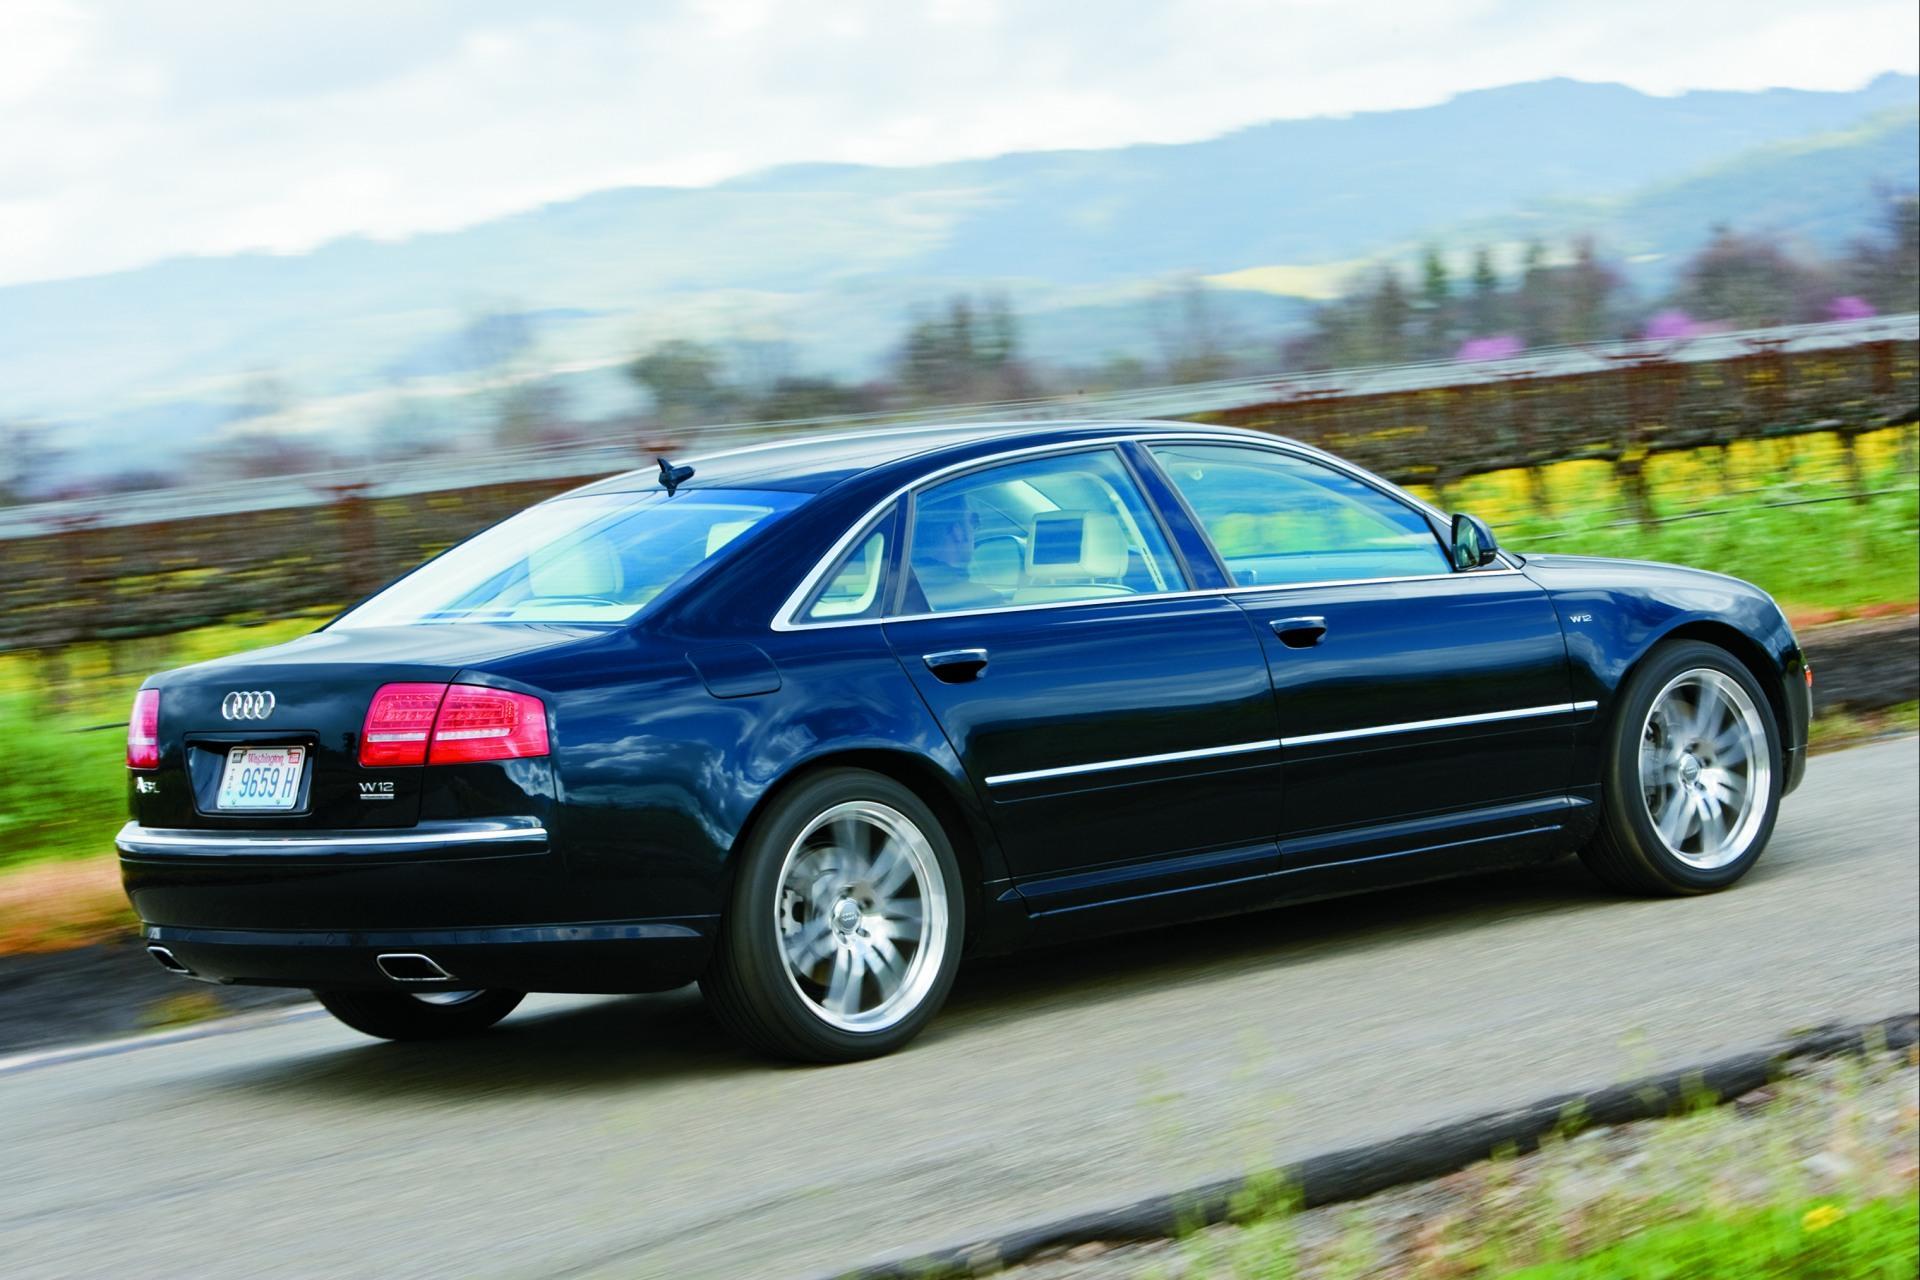 2009 Audi A8 Image 10